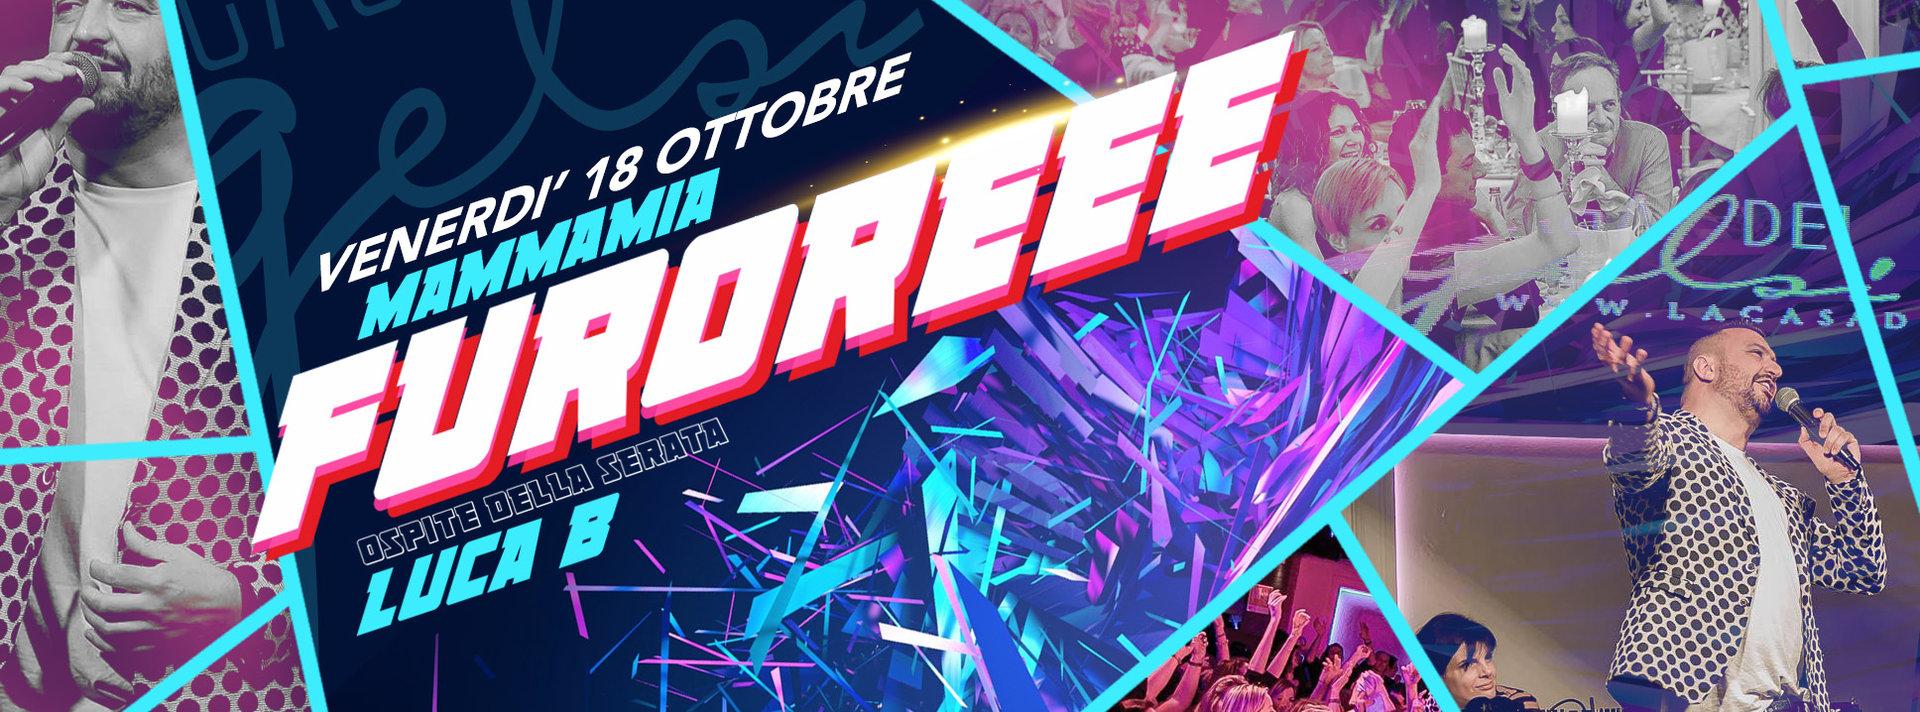 Furoreee - 18 ottobre 2019